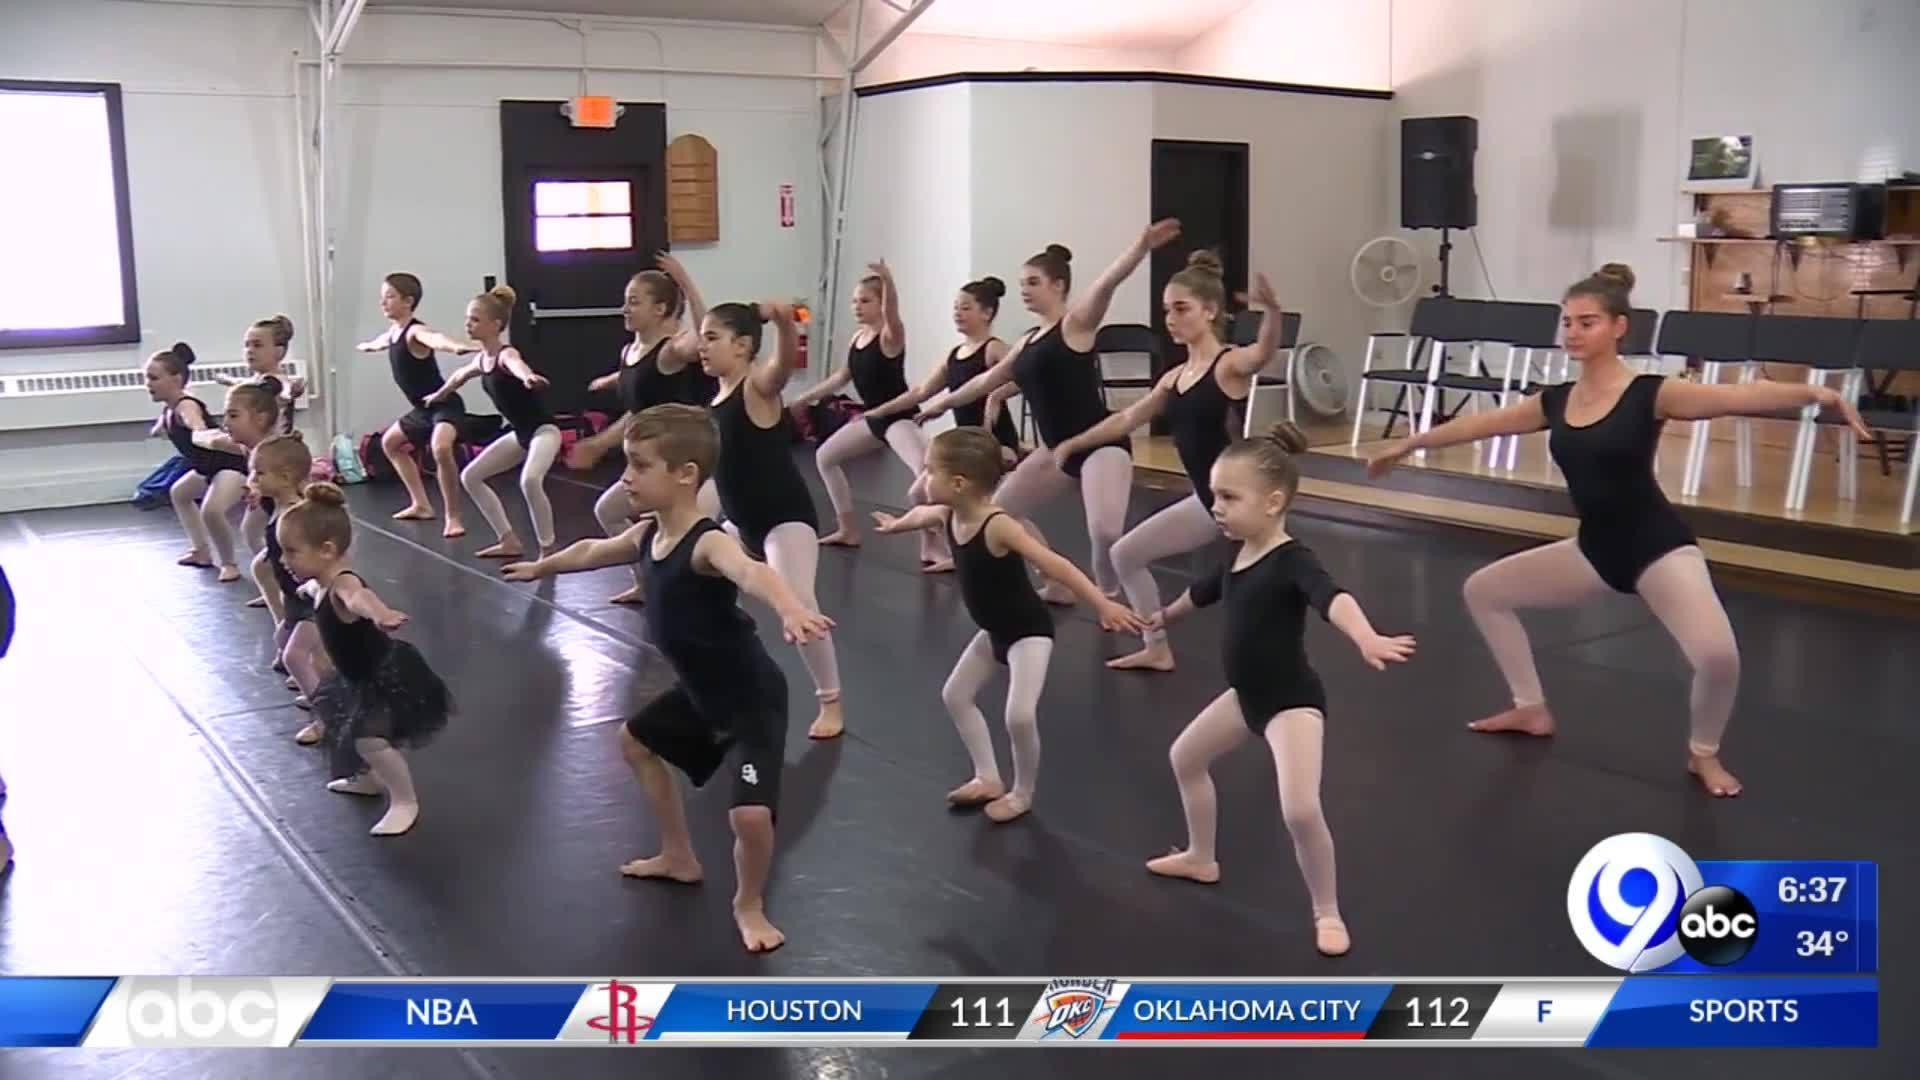 Brewerton_studio_dances_for_donations_to_8_20190410114502